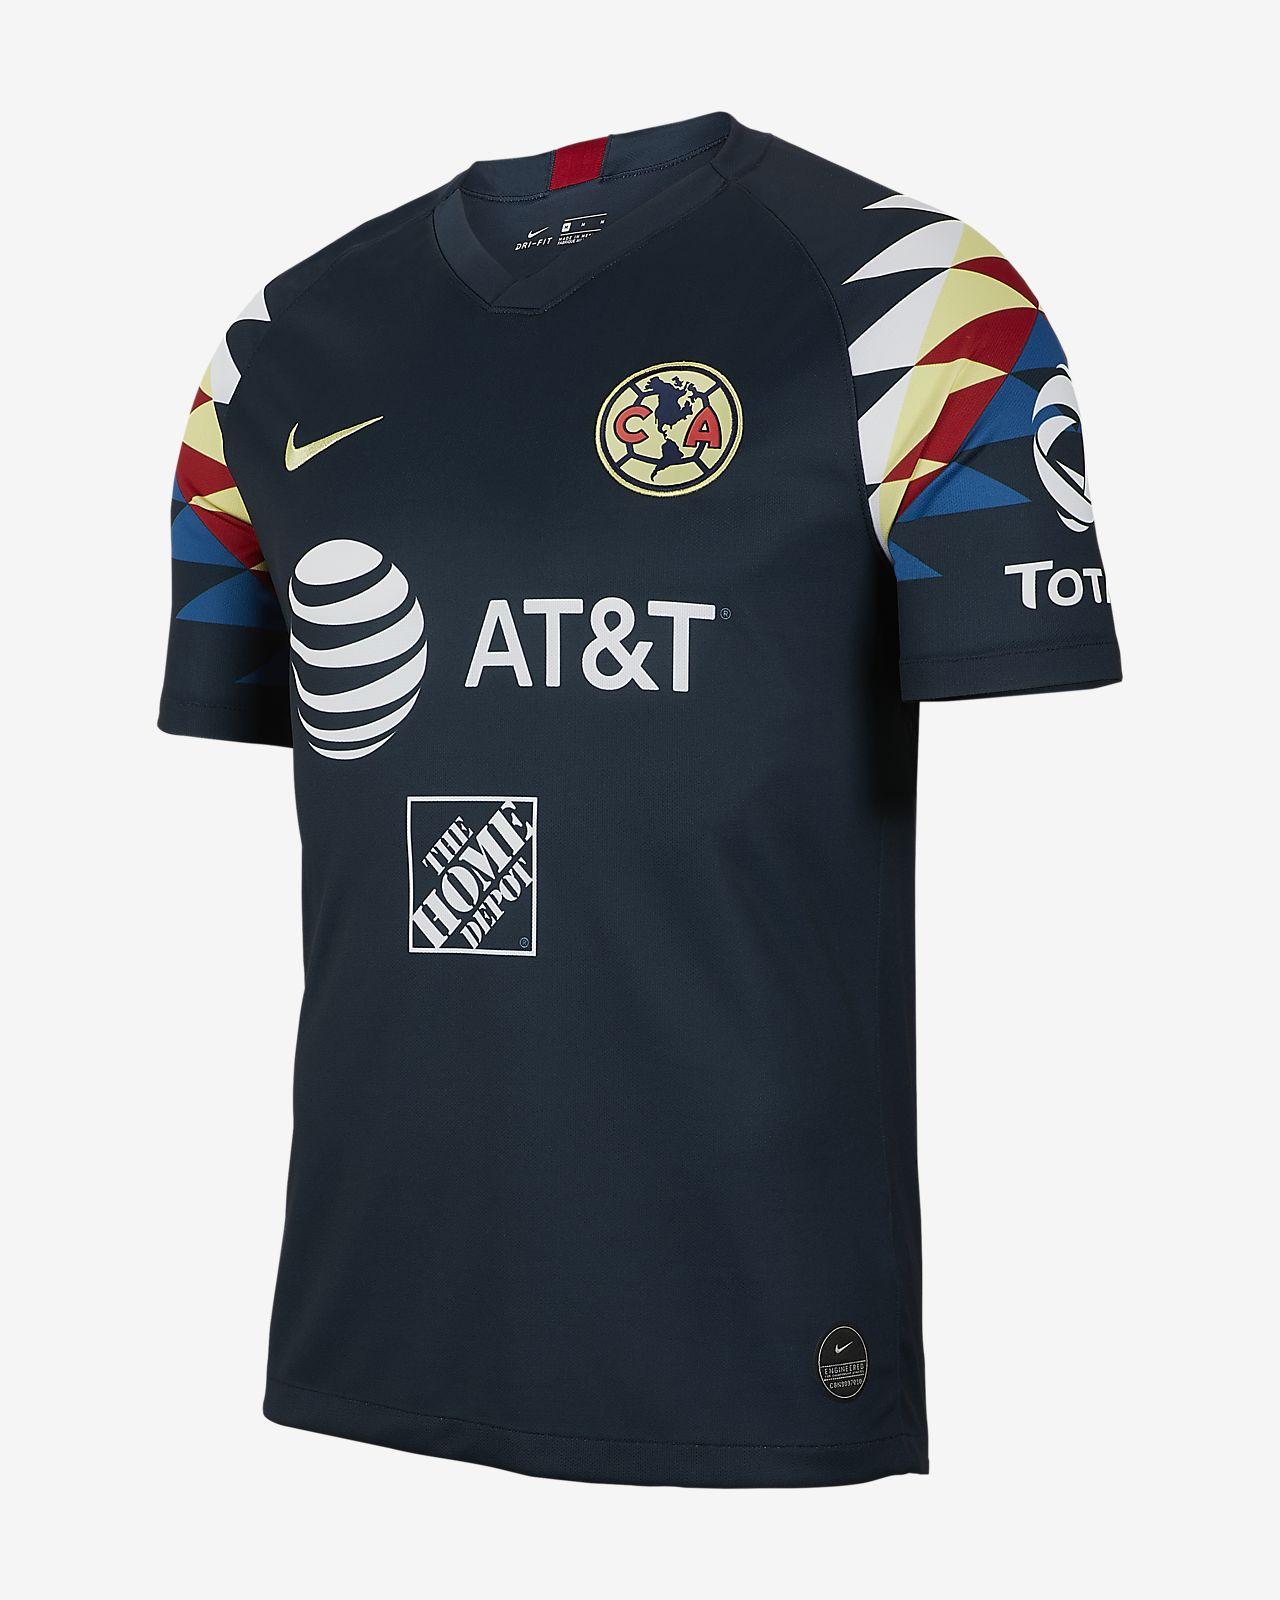 online retailer bfcc7 66432 Club América 2019/20 Stadium Away Men's Soccer Jersey